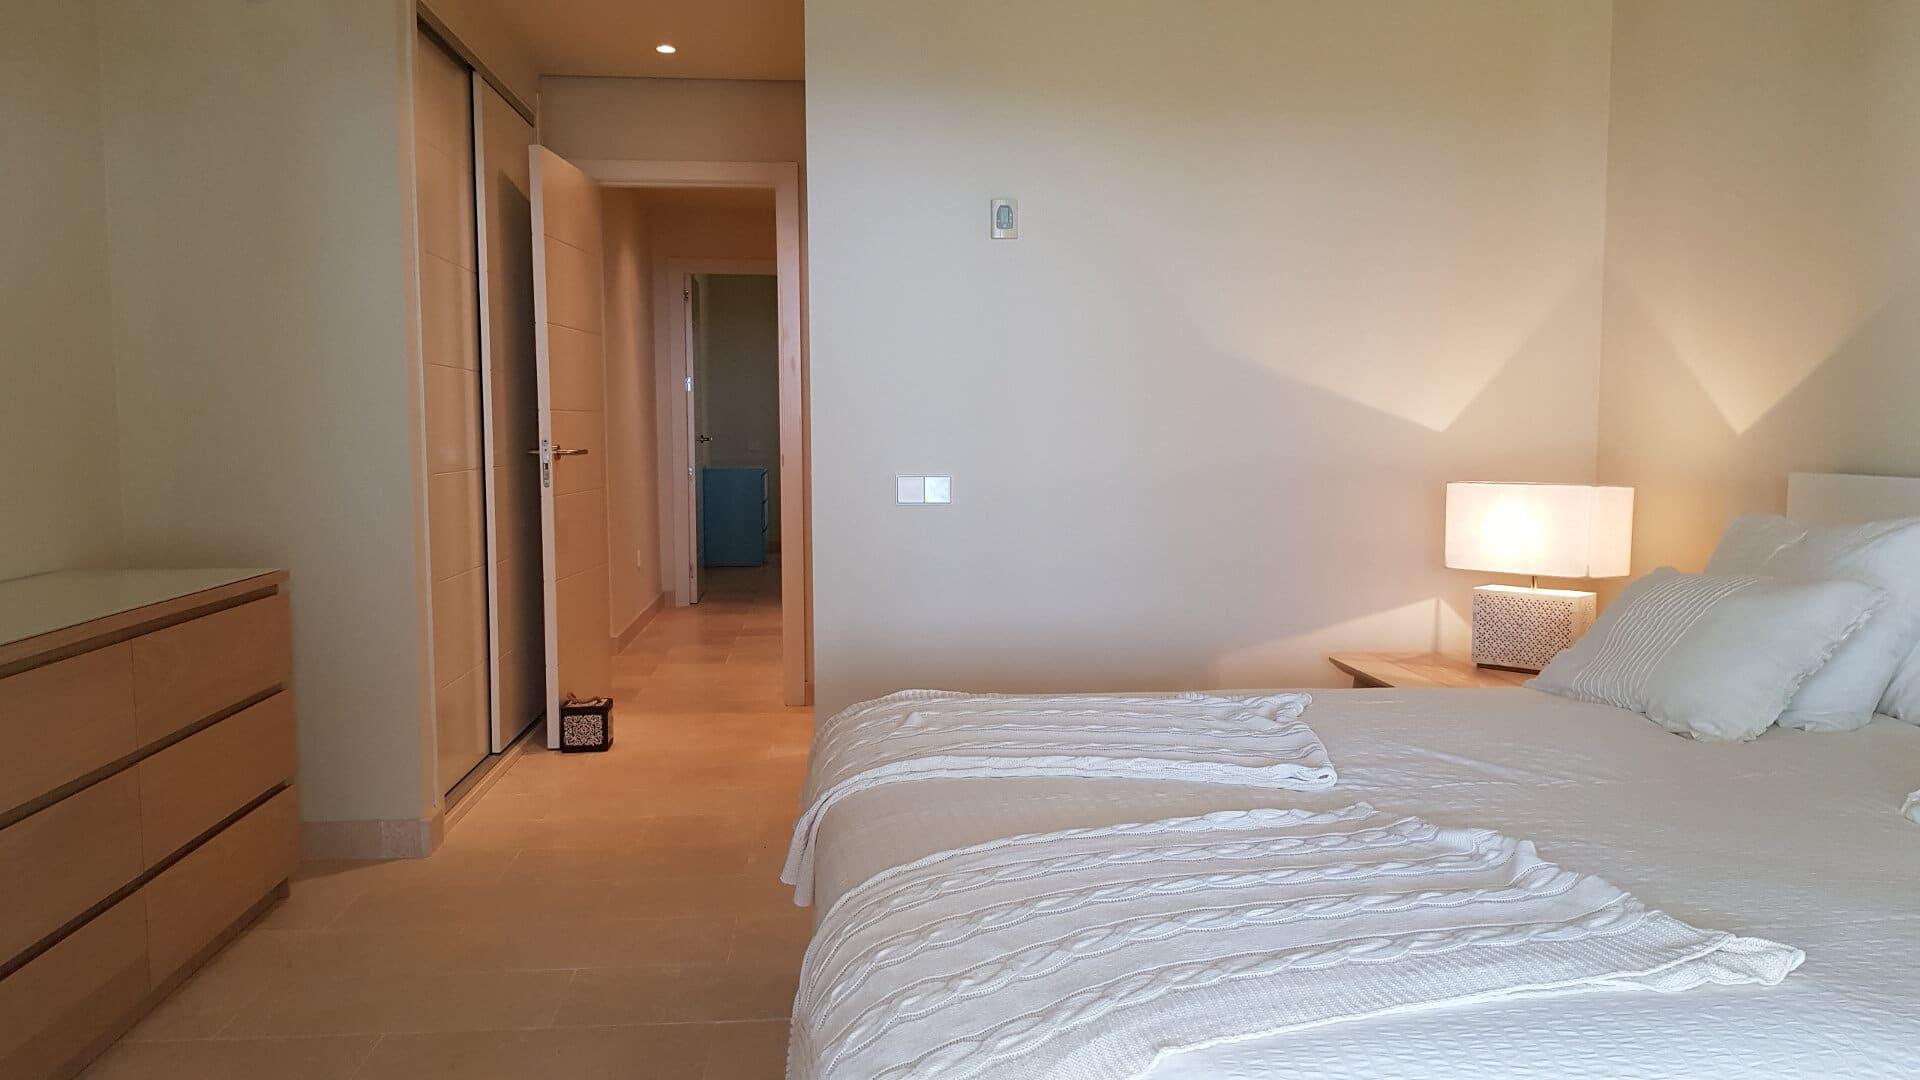 Apartment Within Finca Cortesin Golf Resort Realista